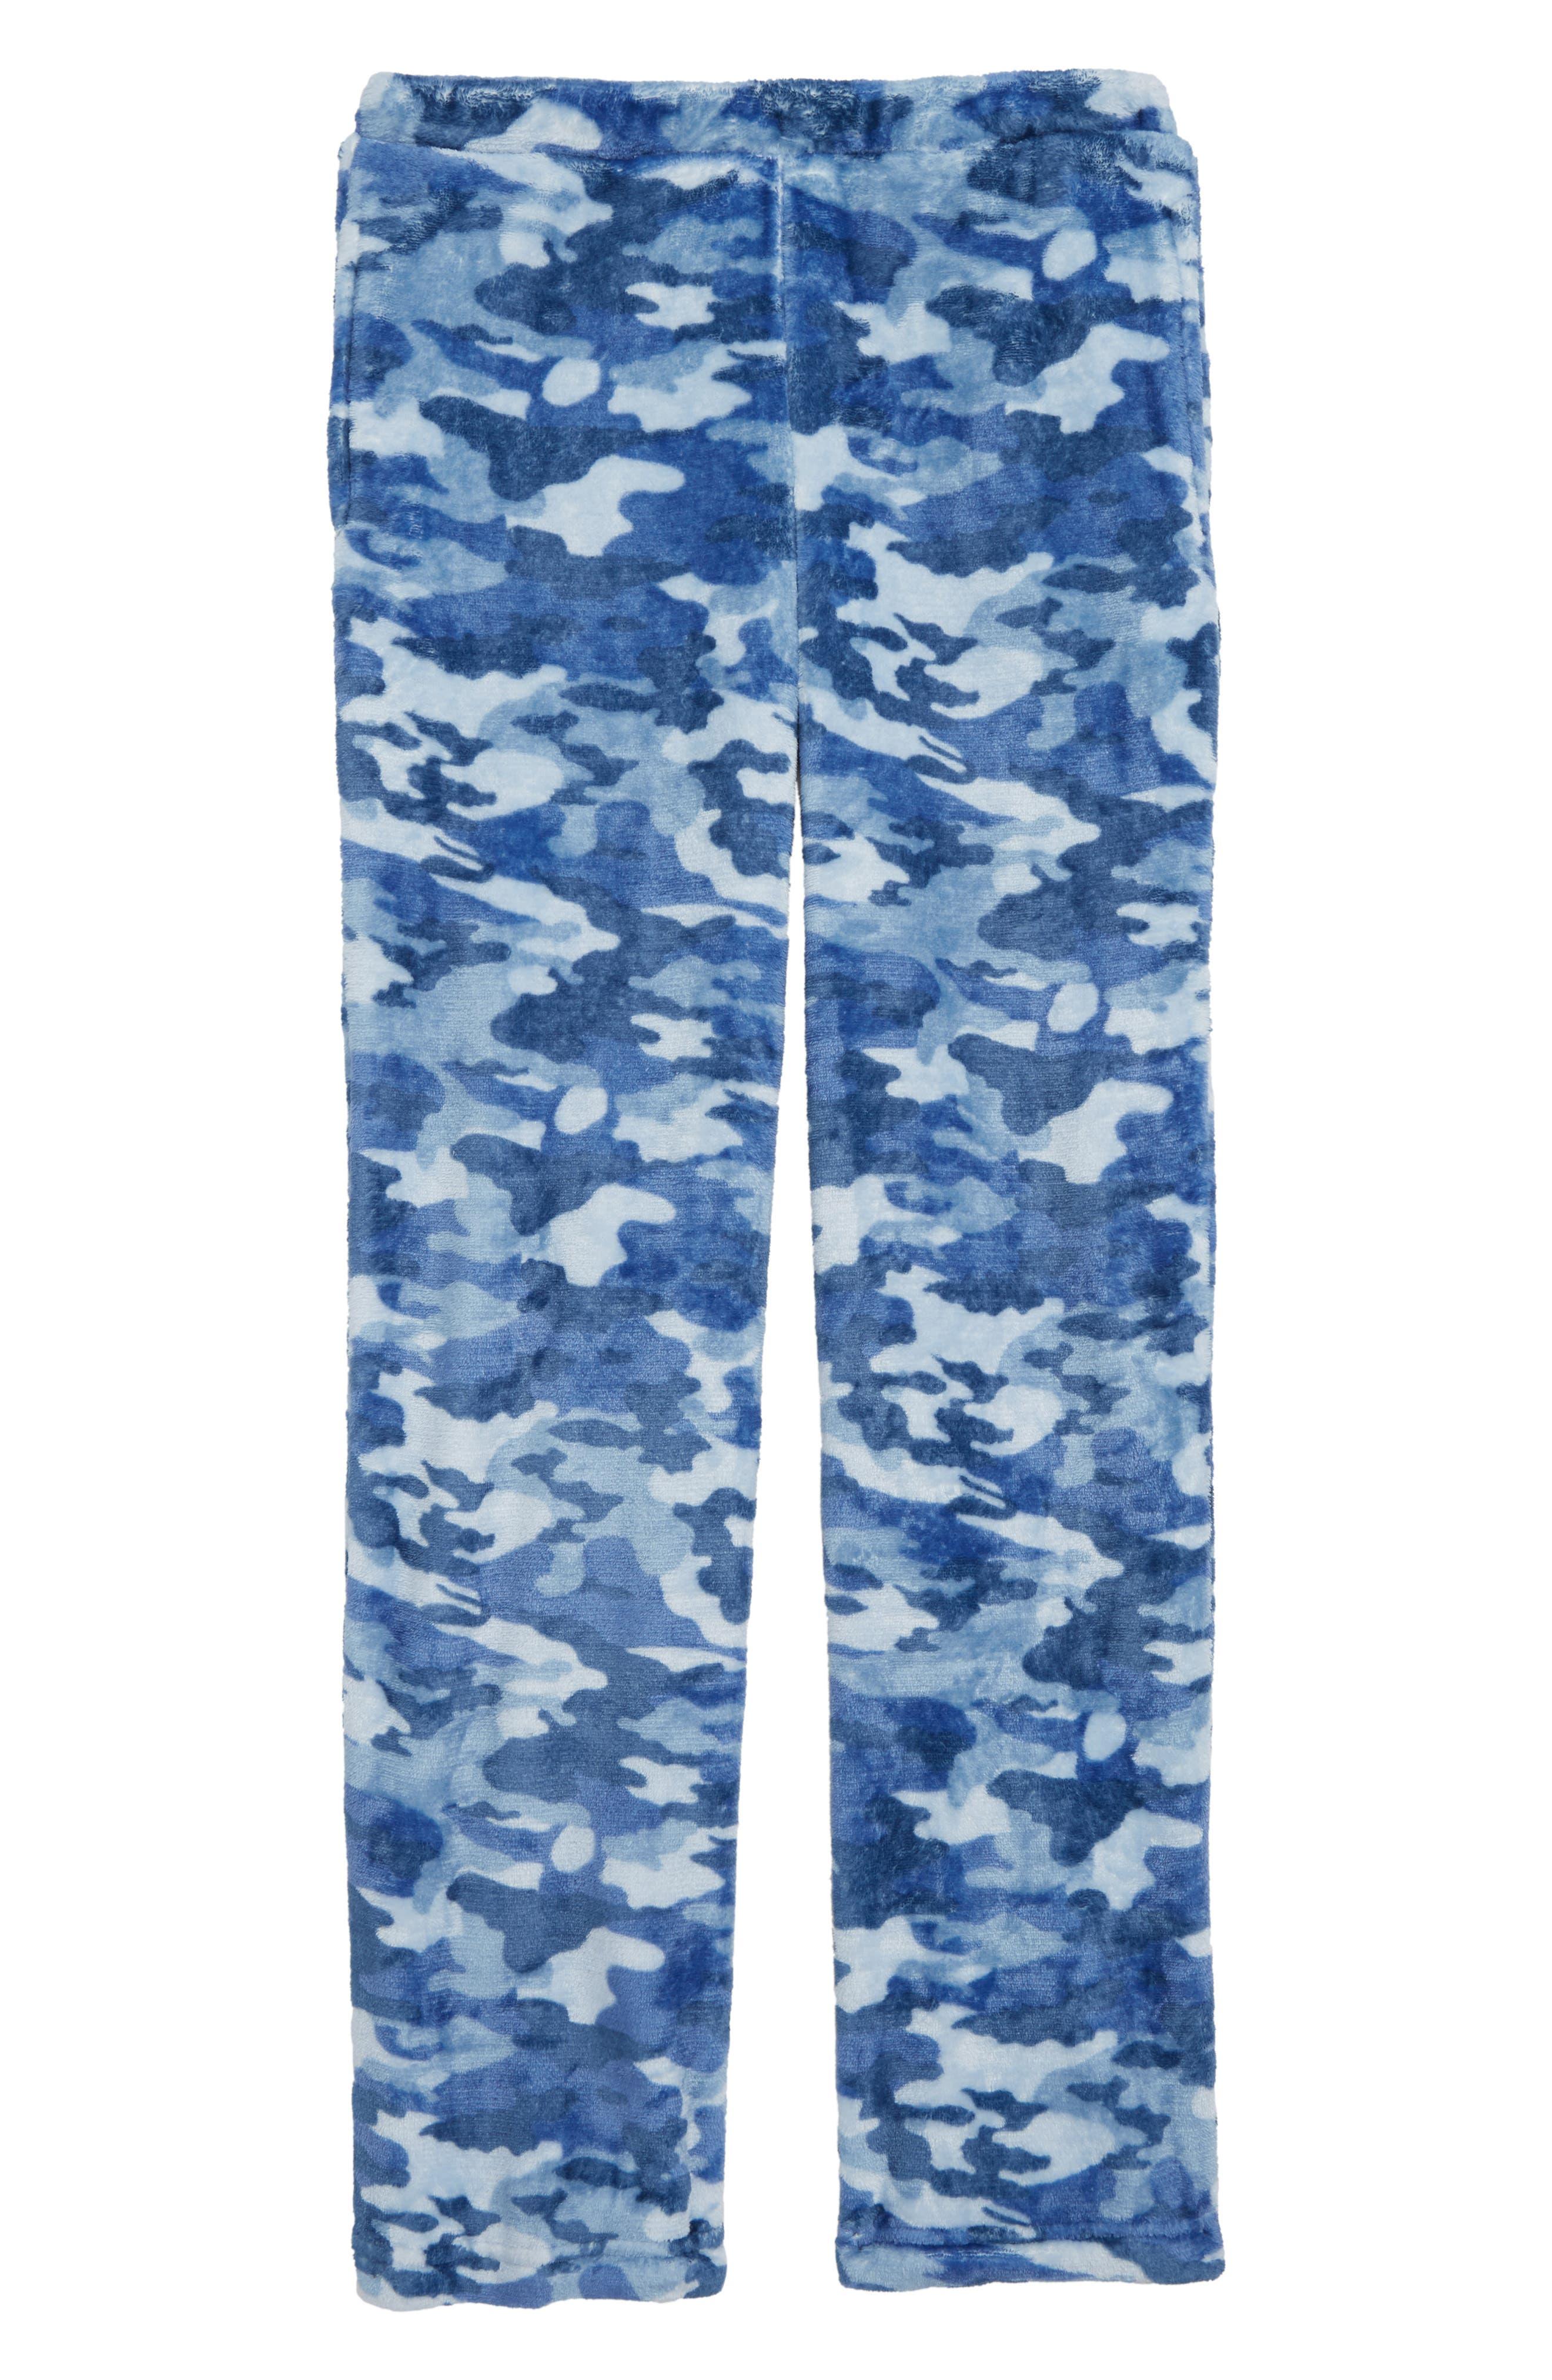 Camo Fleece Pajama Pants,                         Main,                         color, NAVY